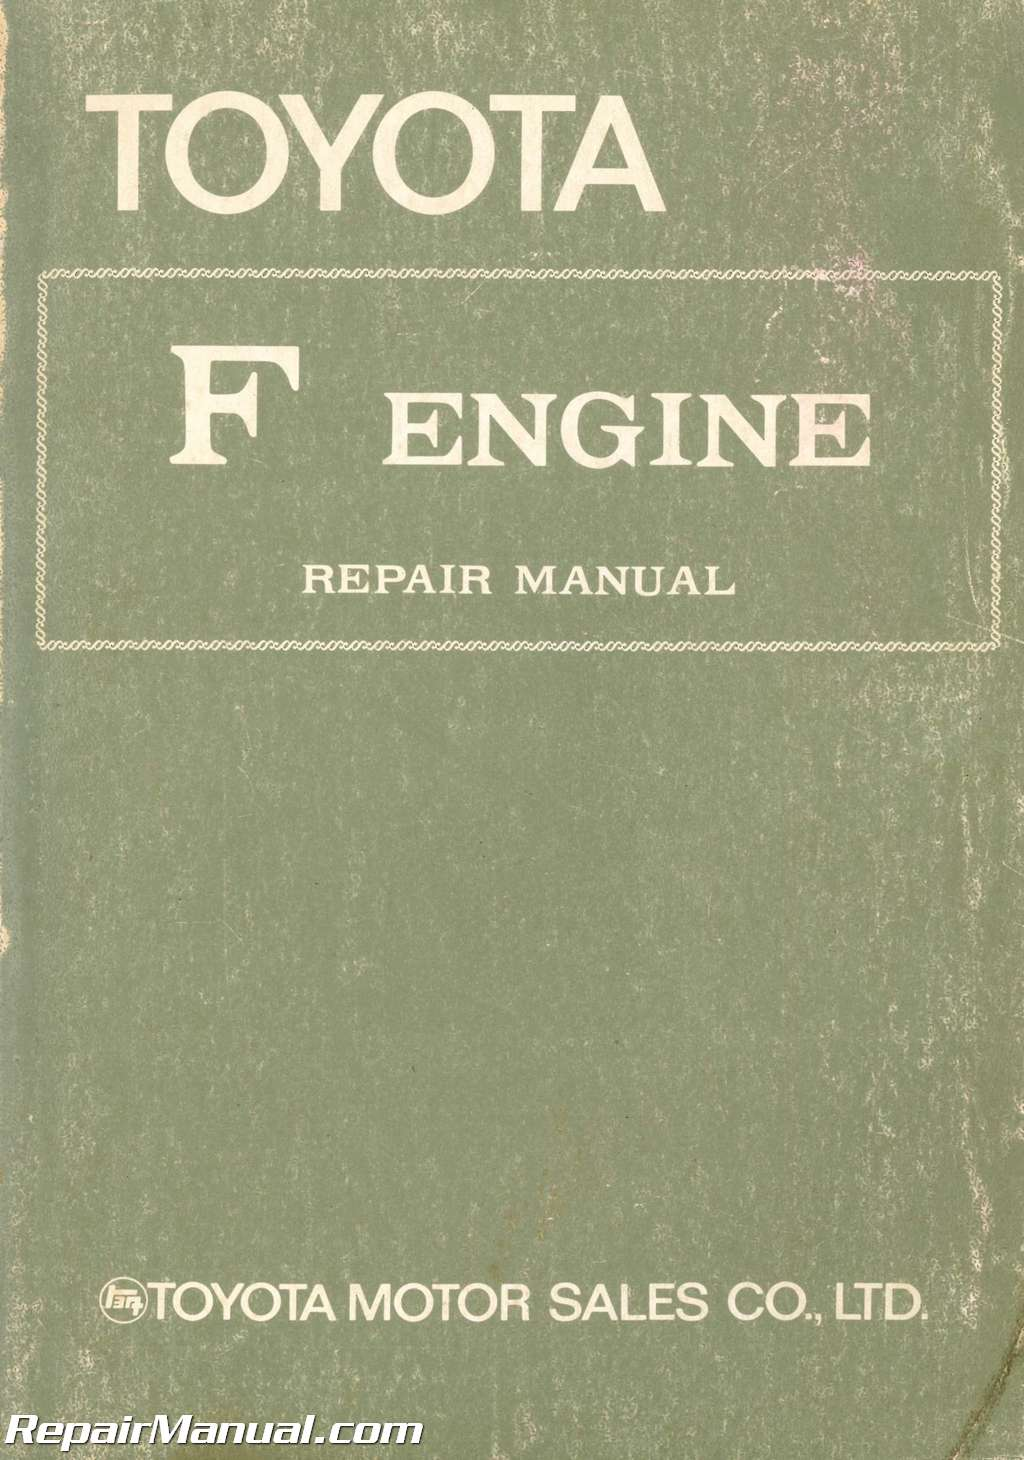 2006 toyota avalon service manual